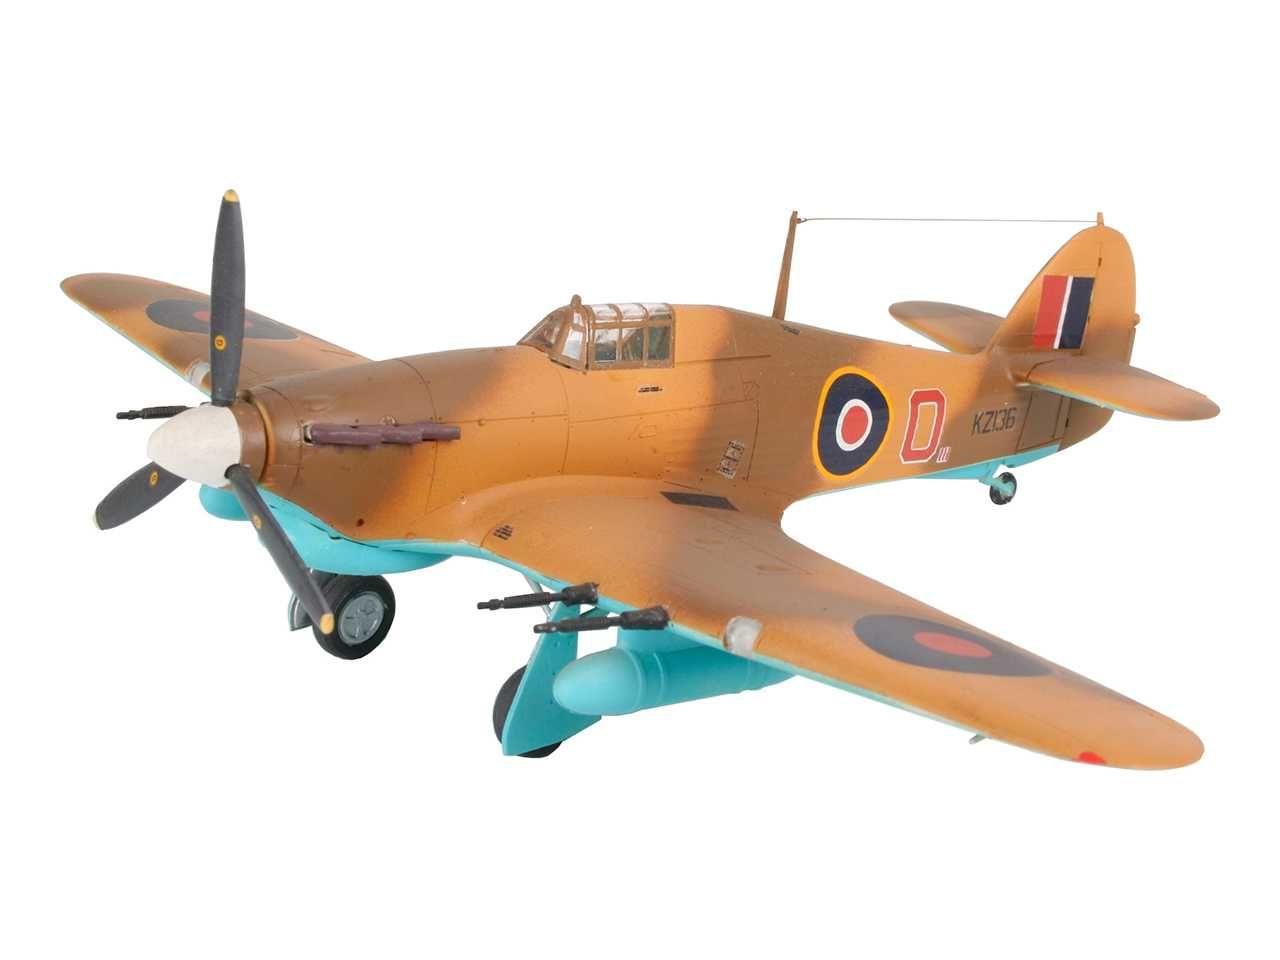 Plastic ModelKit letadlo 04144 - Hawker Hurricane Mk.IIC (1:72) Plastikové modely